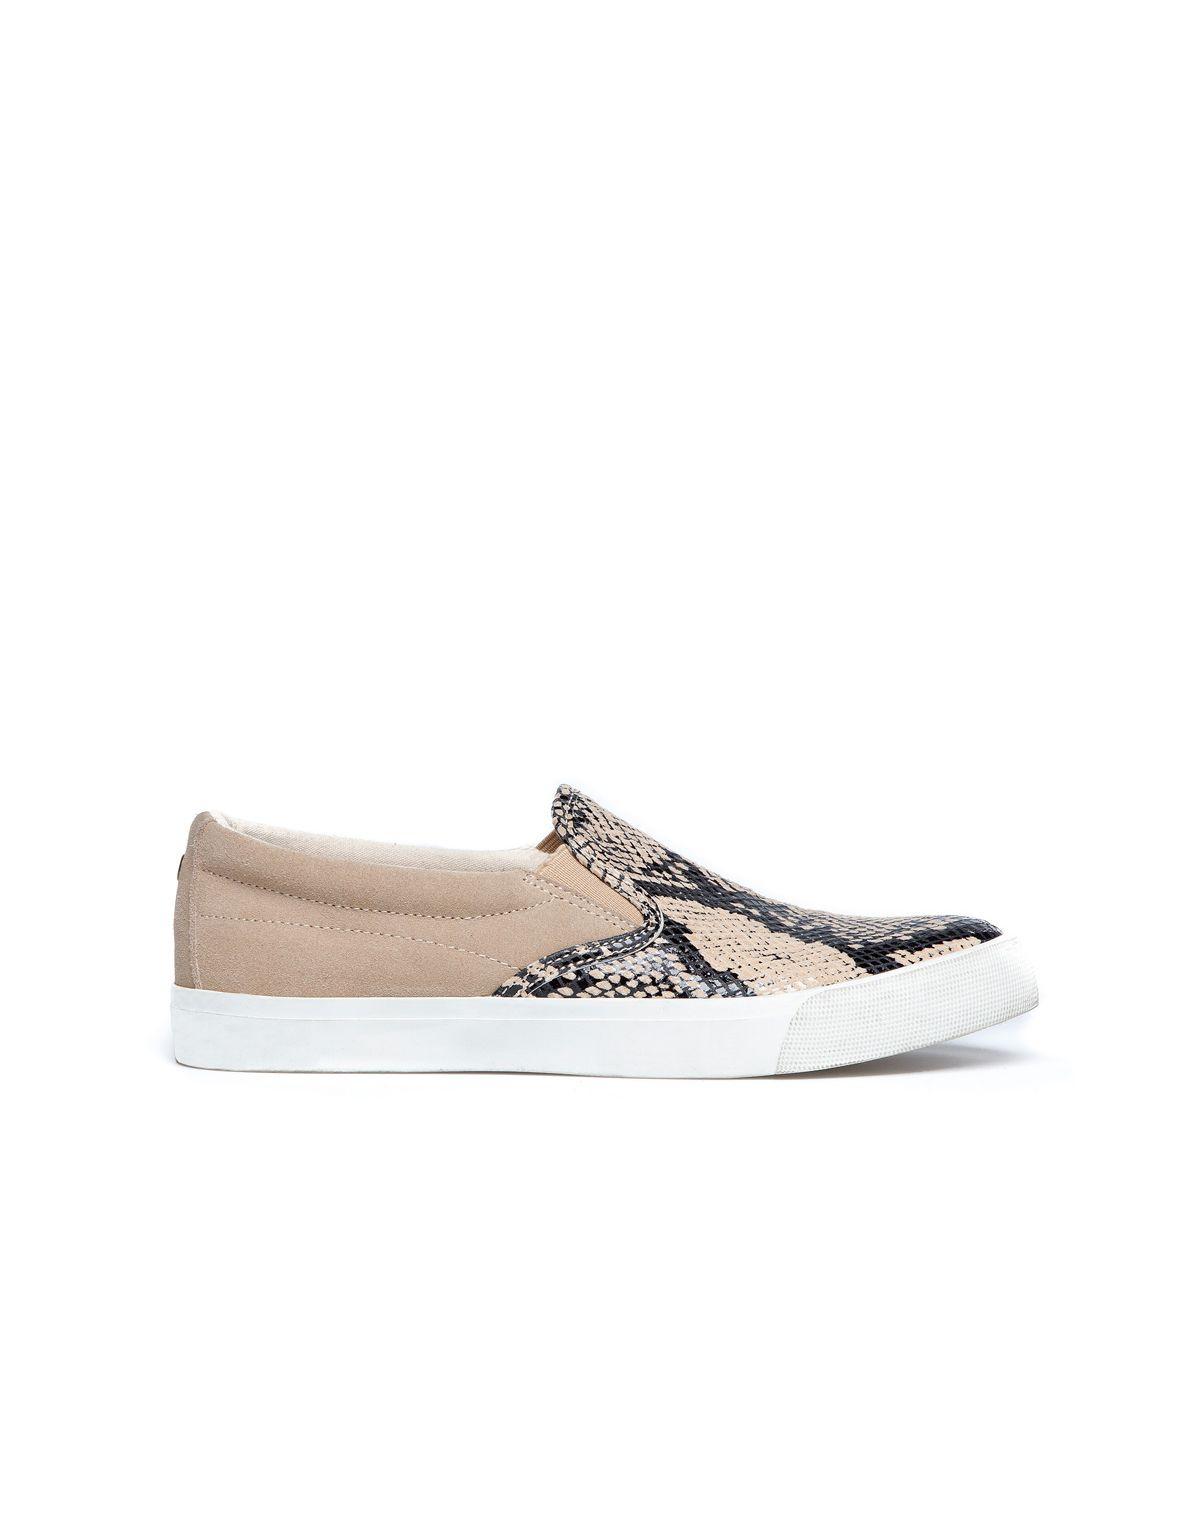 Slip on Sneakers – O conforto a seus pés   Cortefiel